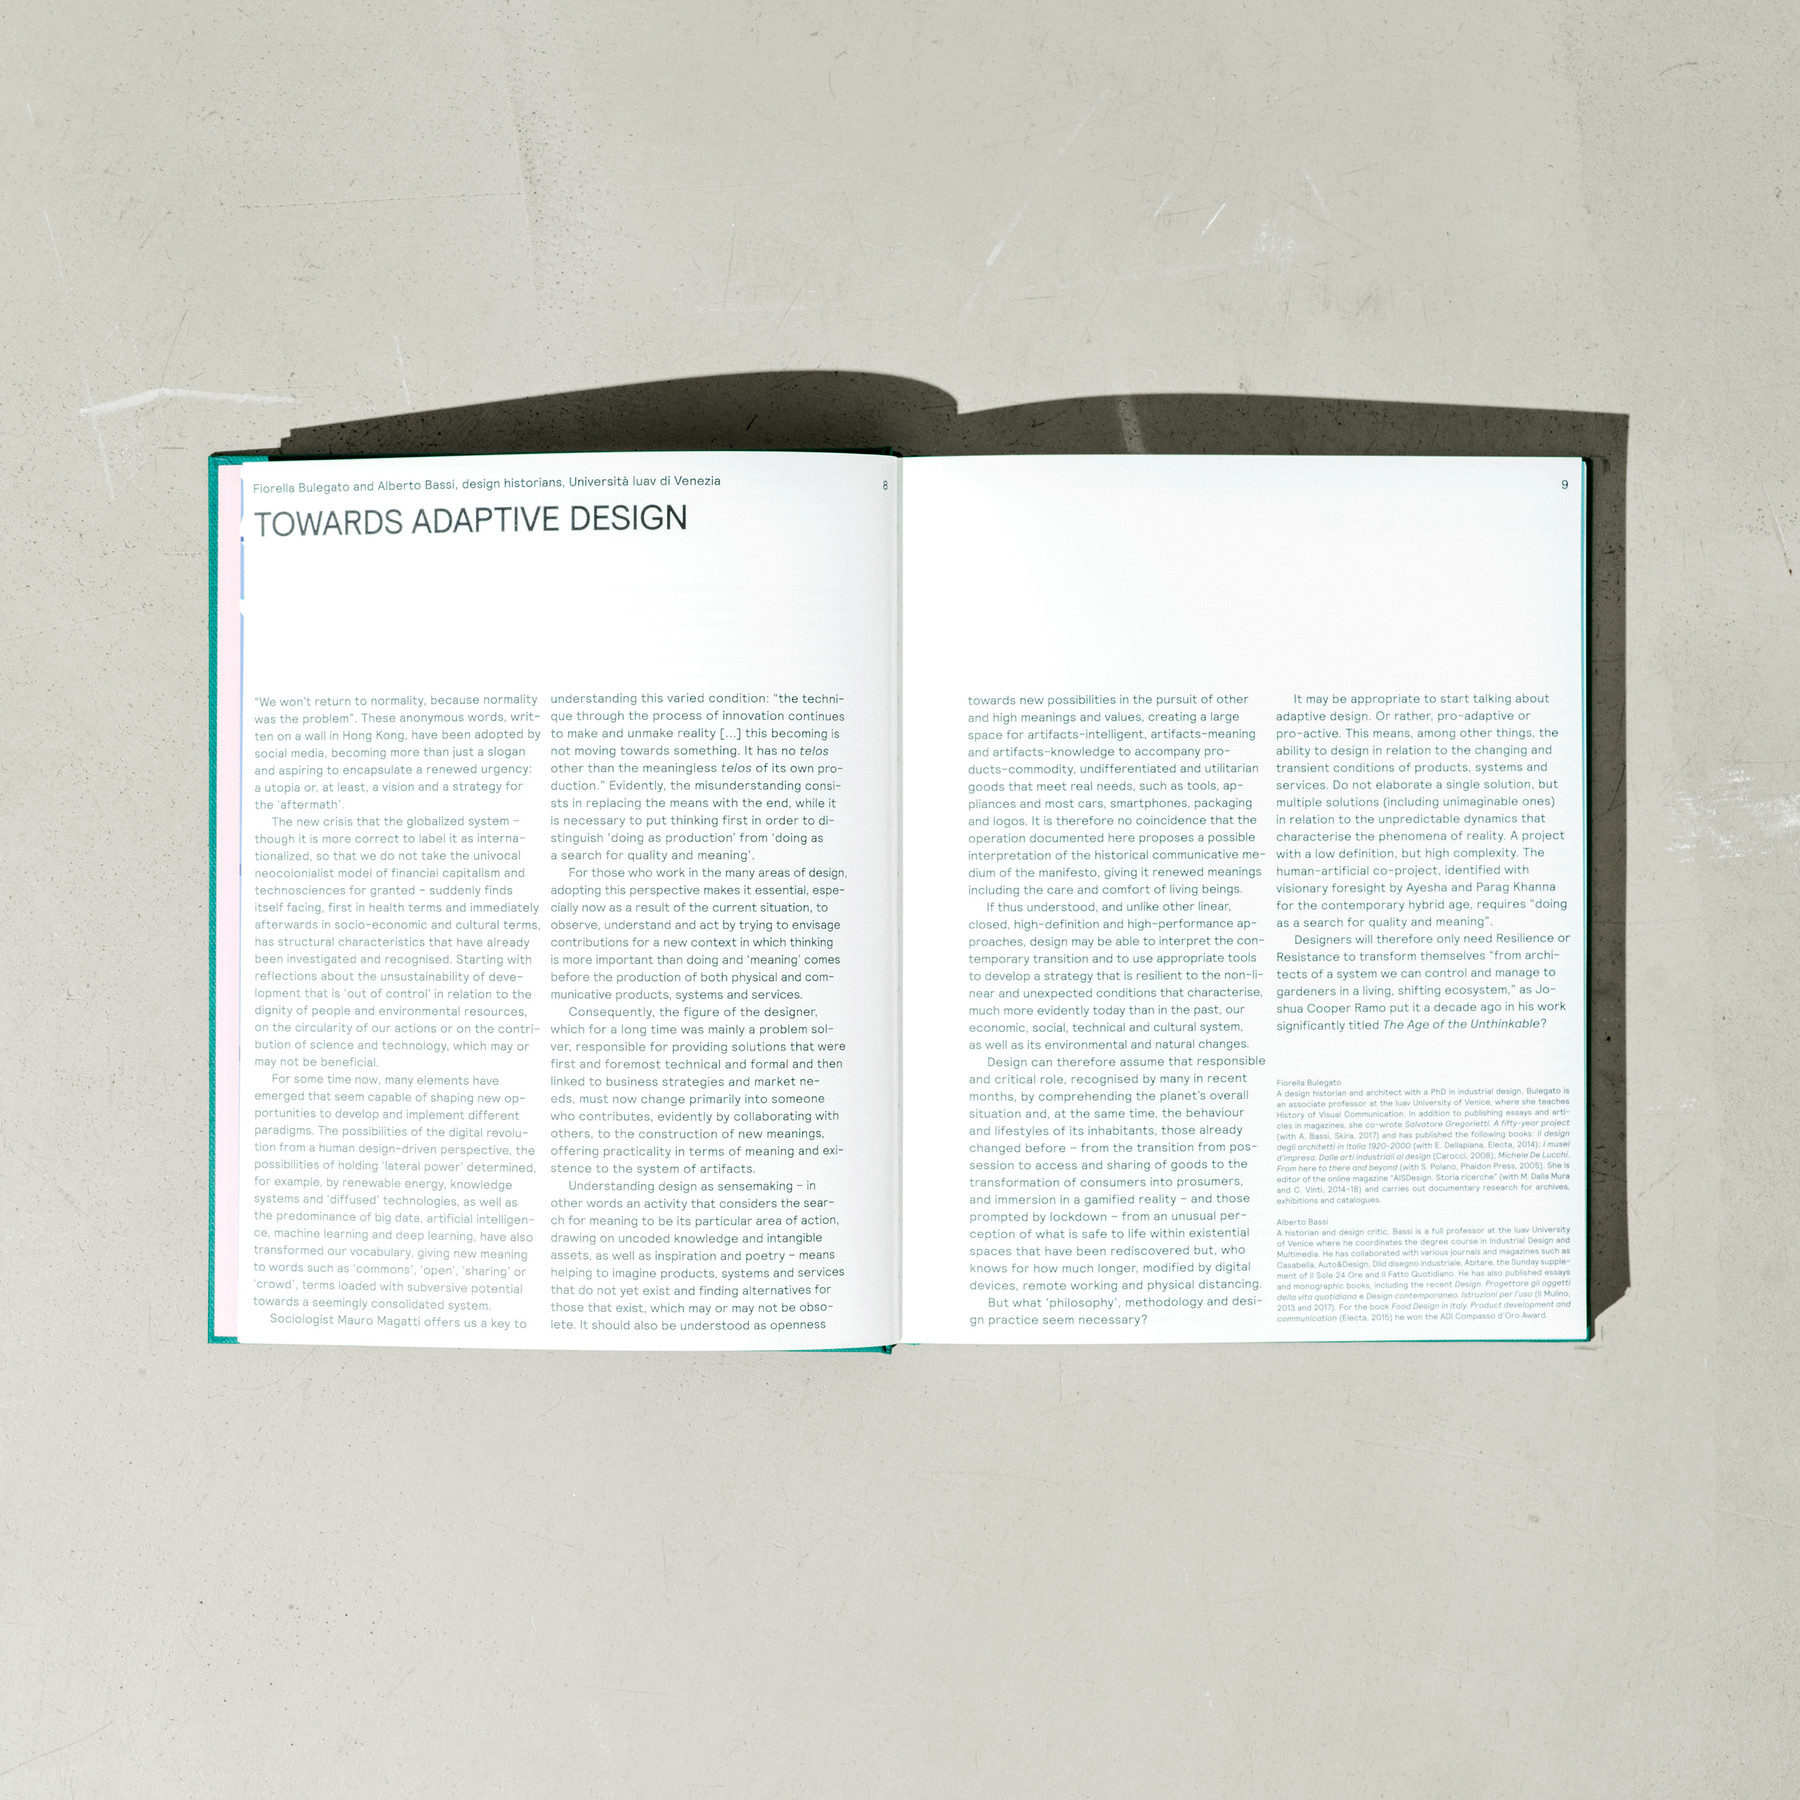 DAC Book CaroselloLab 021